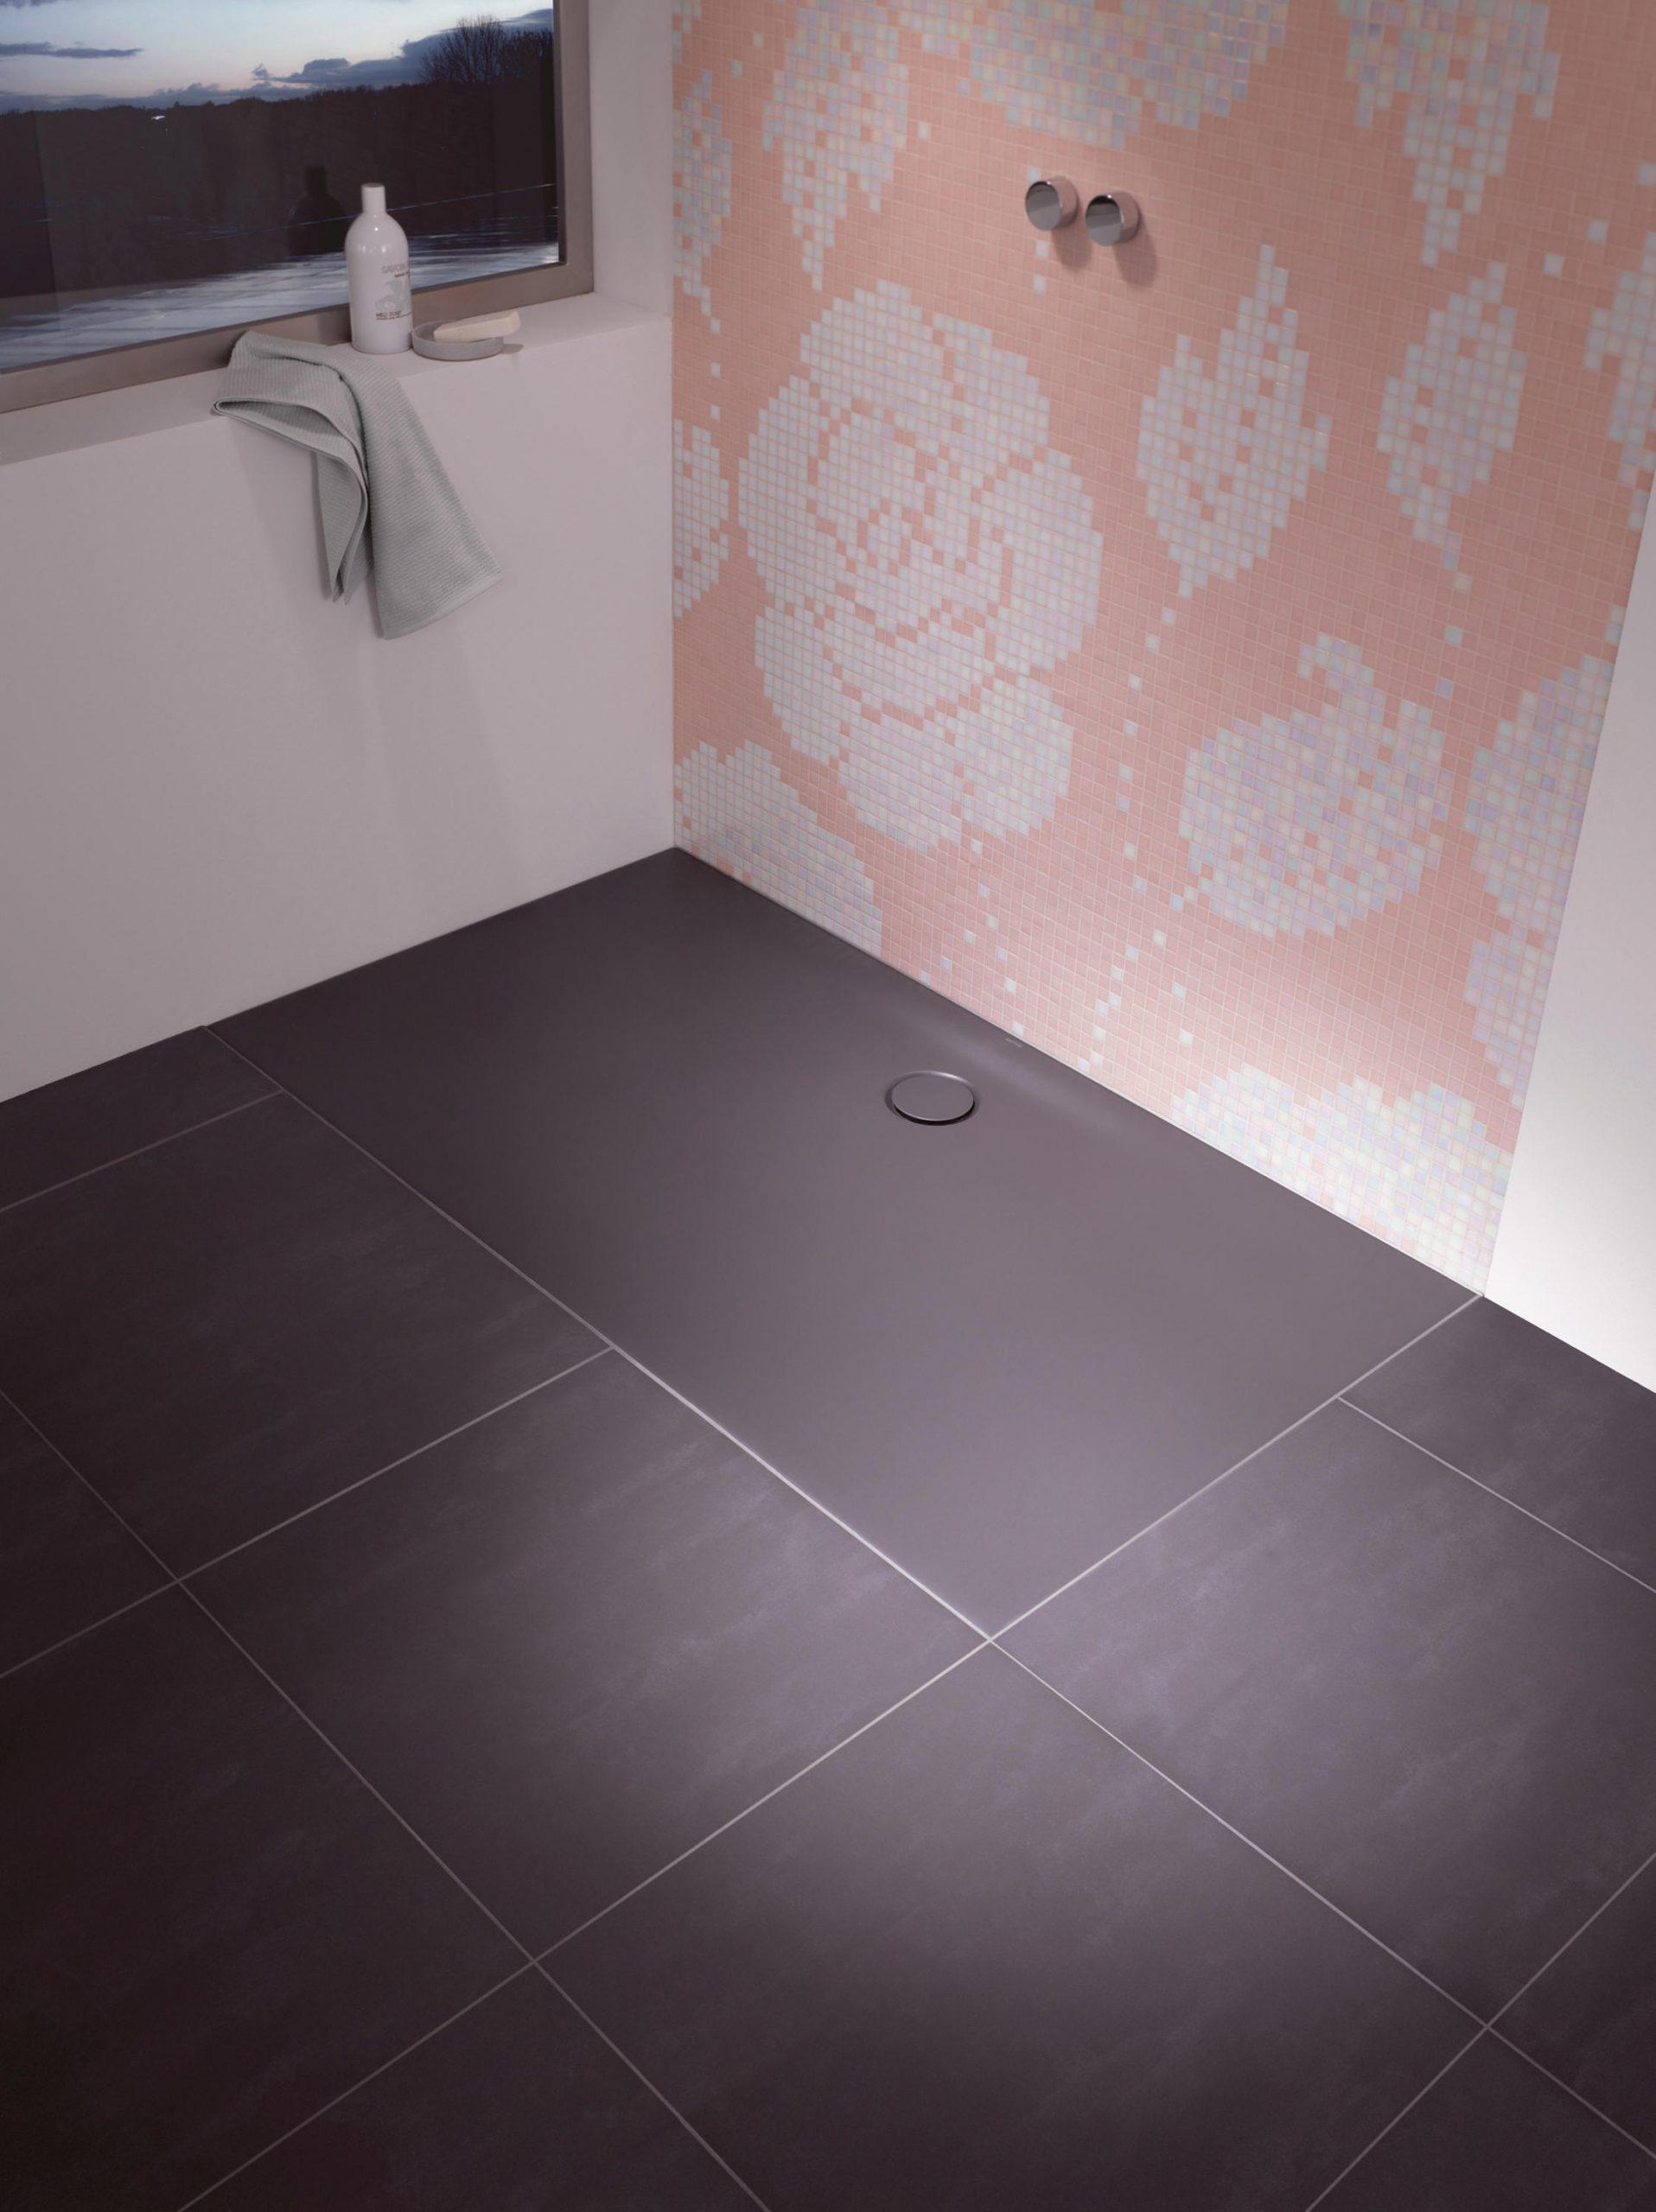 Full Size of Bette Floor Installation Video Side Douchebak Duschwanne Abfluss Reinigen Bettefloor Shower Tray Brausetasse Reinigung Colours Waste Trays From Architonic Bett Bette Floor